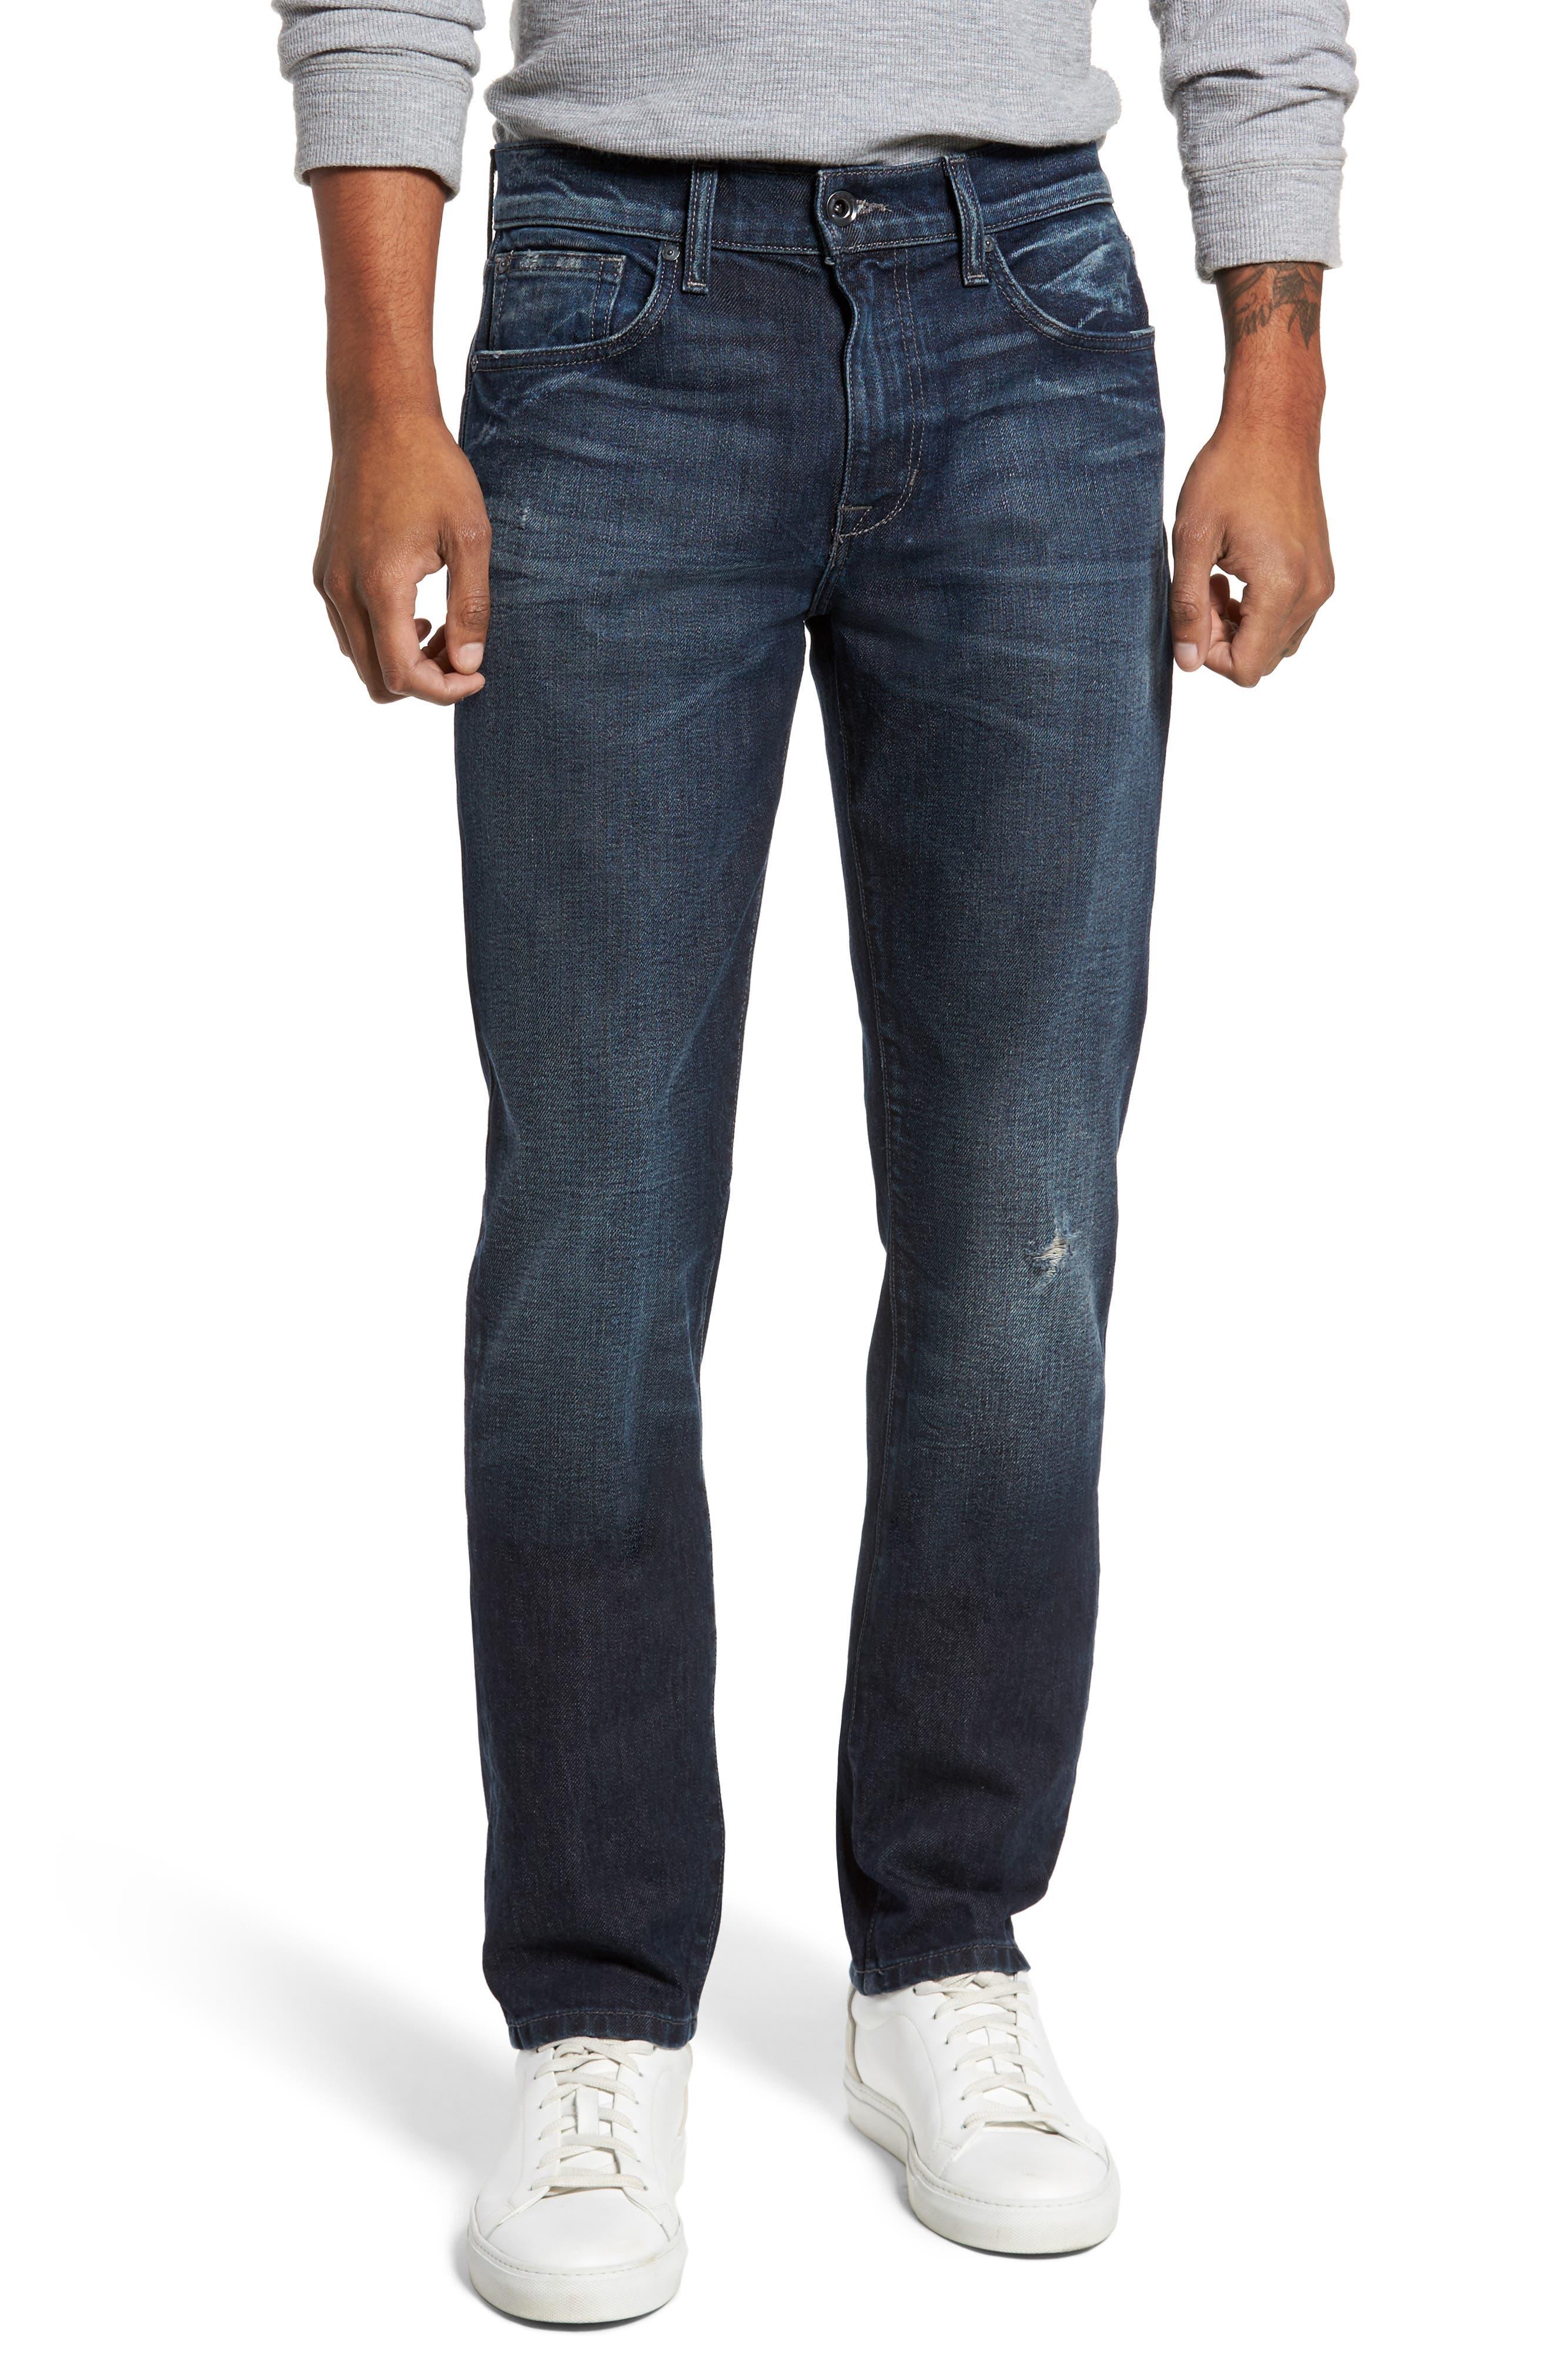 Brixton Slim Straight Leg Jeans,                         Main,                         color, 415